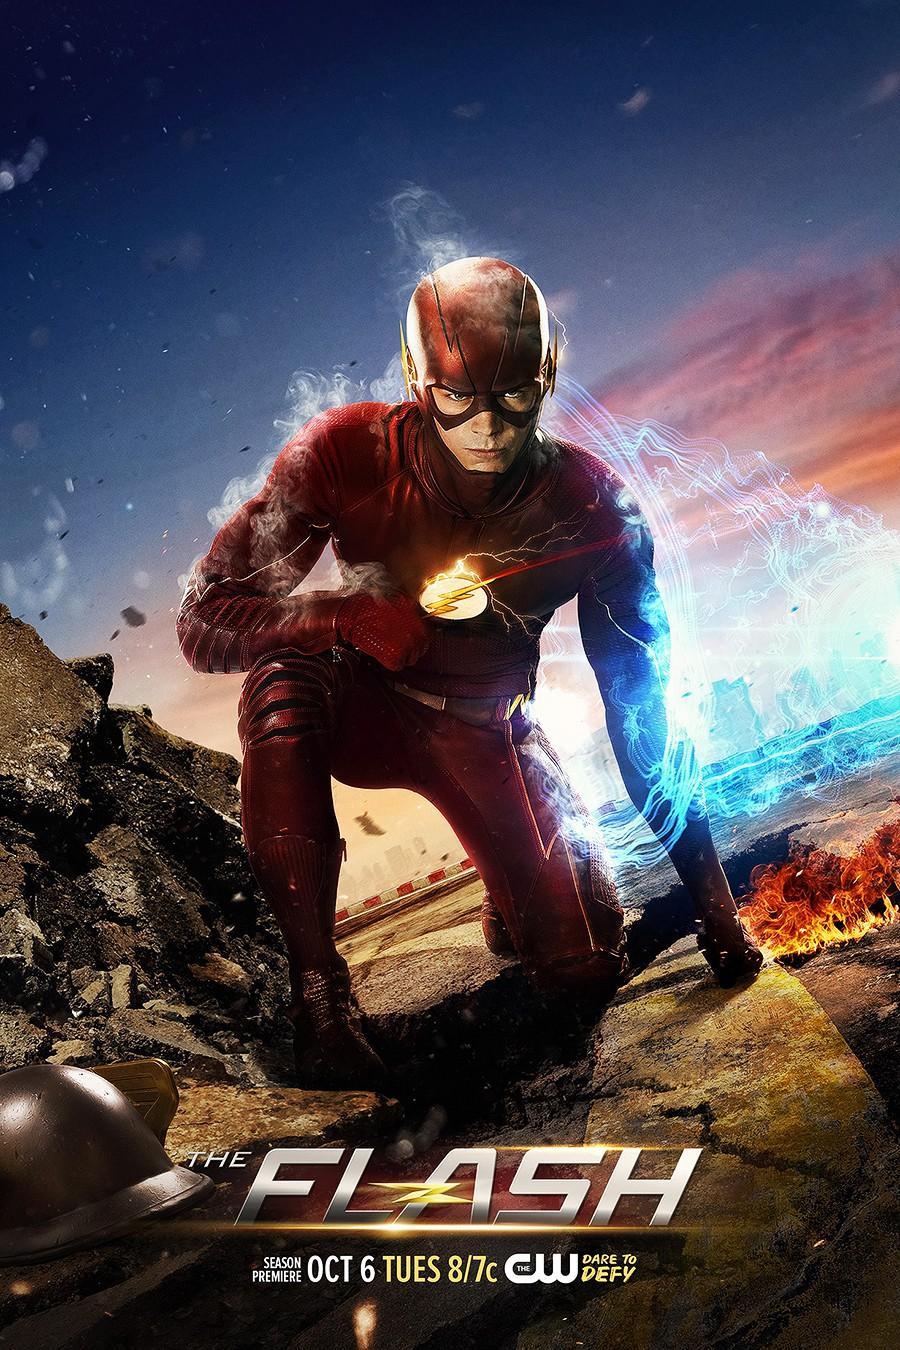 The%20Flash.8 1 دانلود سریال The Flash : قسمت آخر فصل ۴ اضافه شد